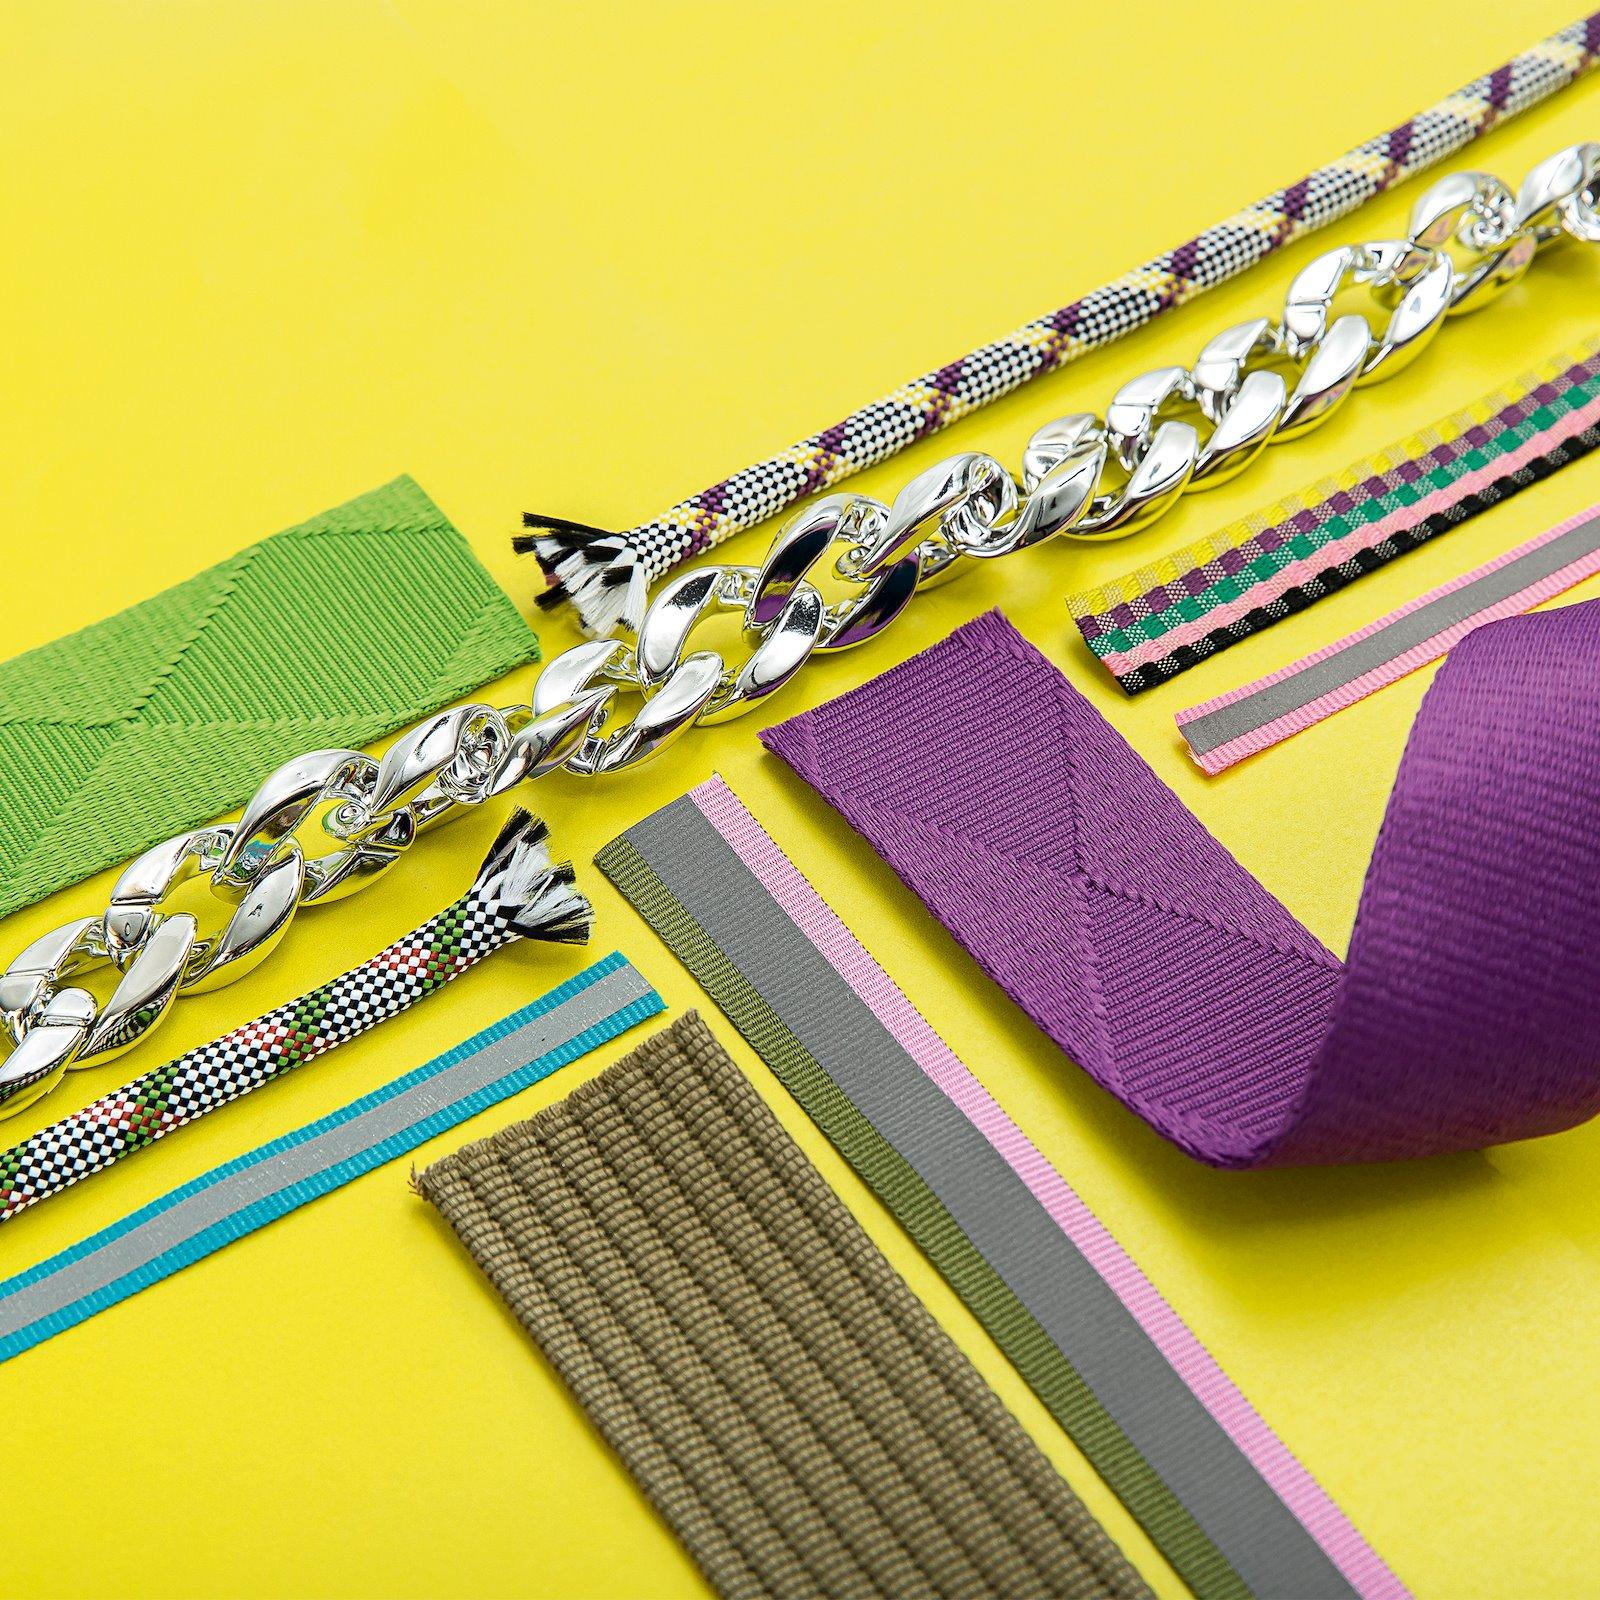 Ribbon woven 40mm olive 2m 22292_22276_38100_22394_22201_22293_22200_22405_22202_22277_bundle